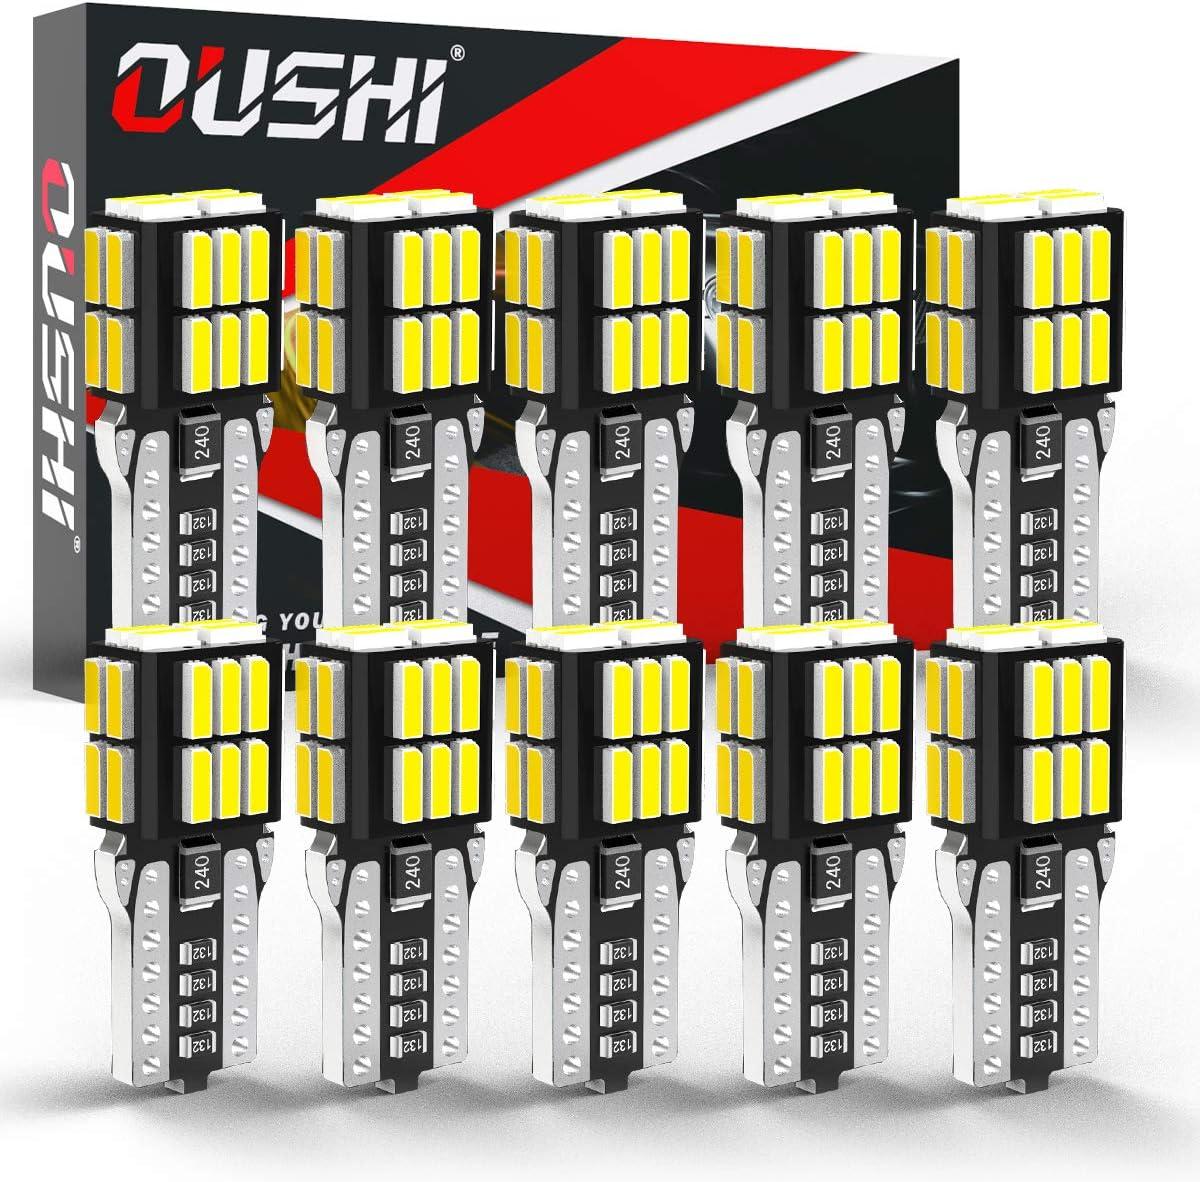 W5W T10 LED Canbus Bombilla, OUSHI 194 168 2825 12V 6500K Xenón Blanco Reemplazo Para El Interior Del Automóvil Cúpula Lateral Placa De Número Luz De Reserva De Estacionamiento (Paquete De 10)